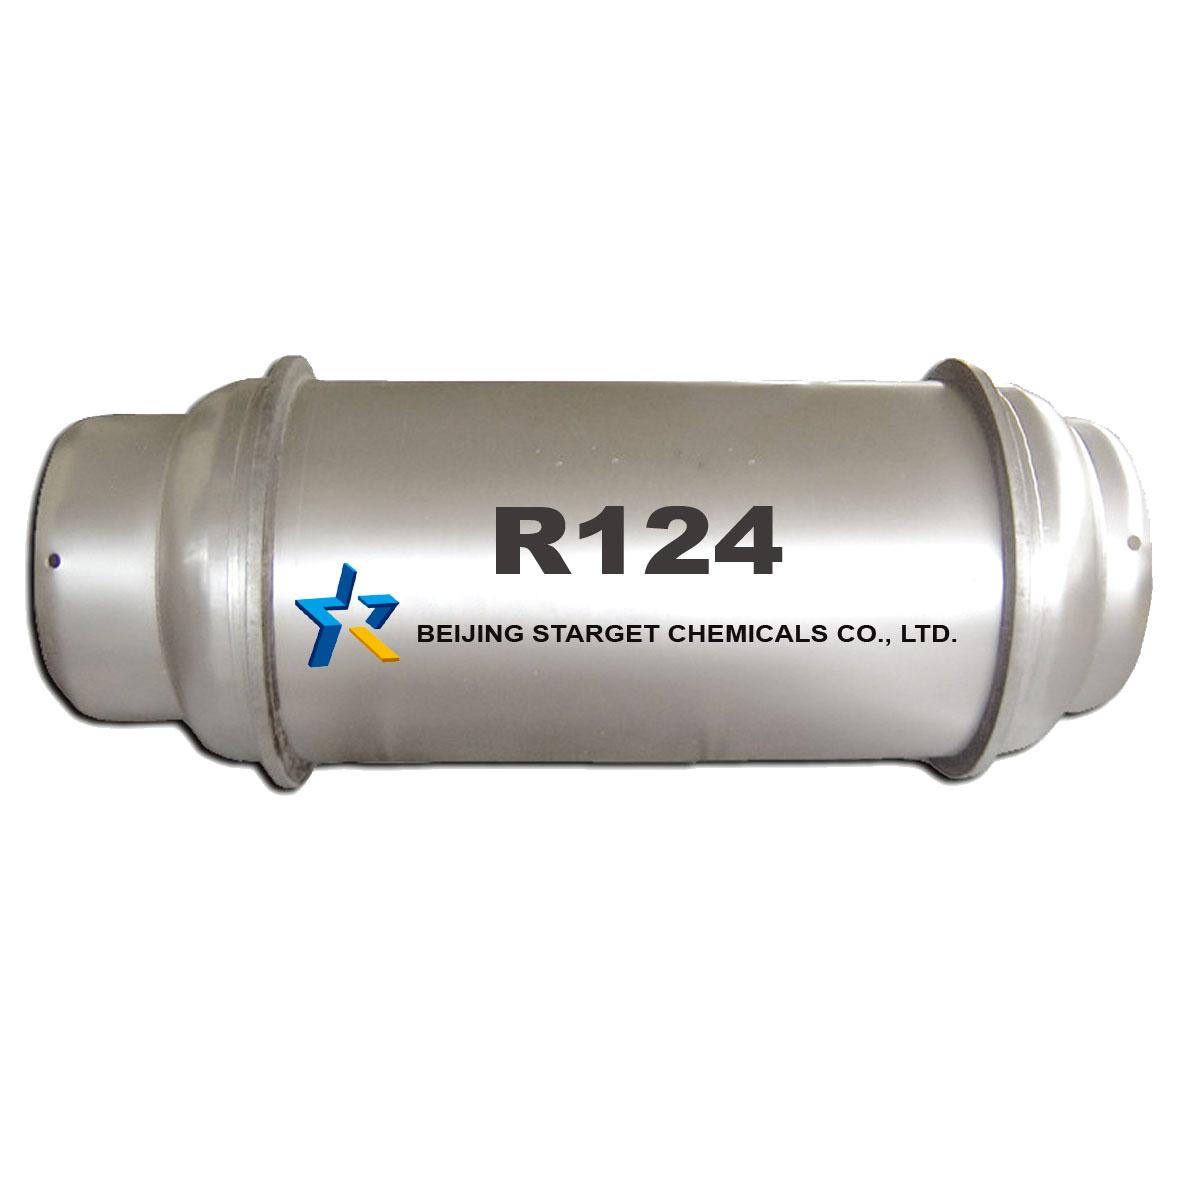 Refrigerant R124